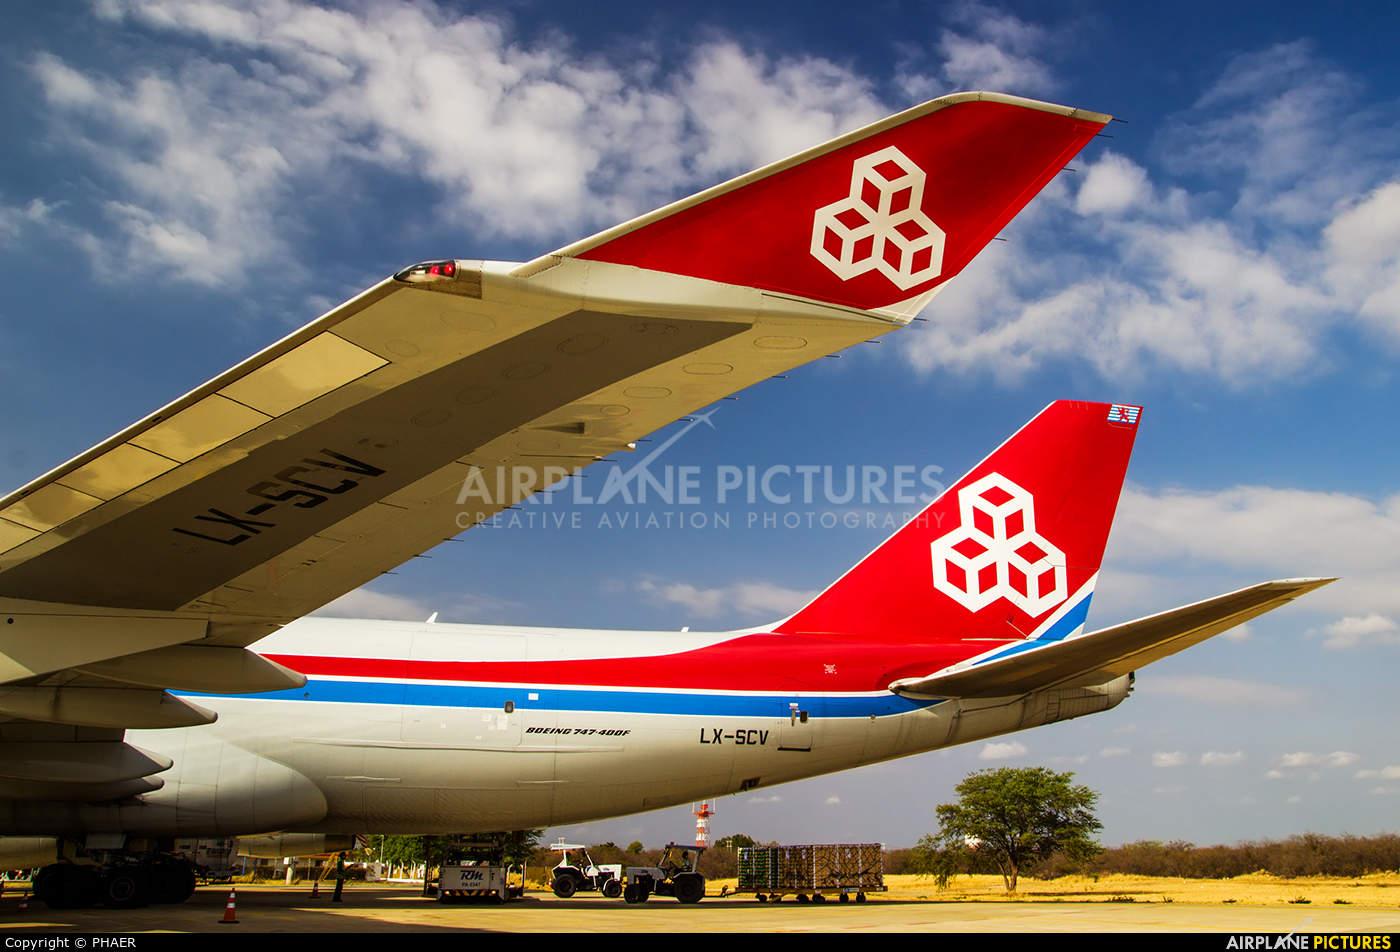 After Cargolux Italia, here comes Cargolux China